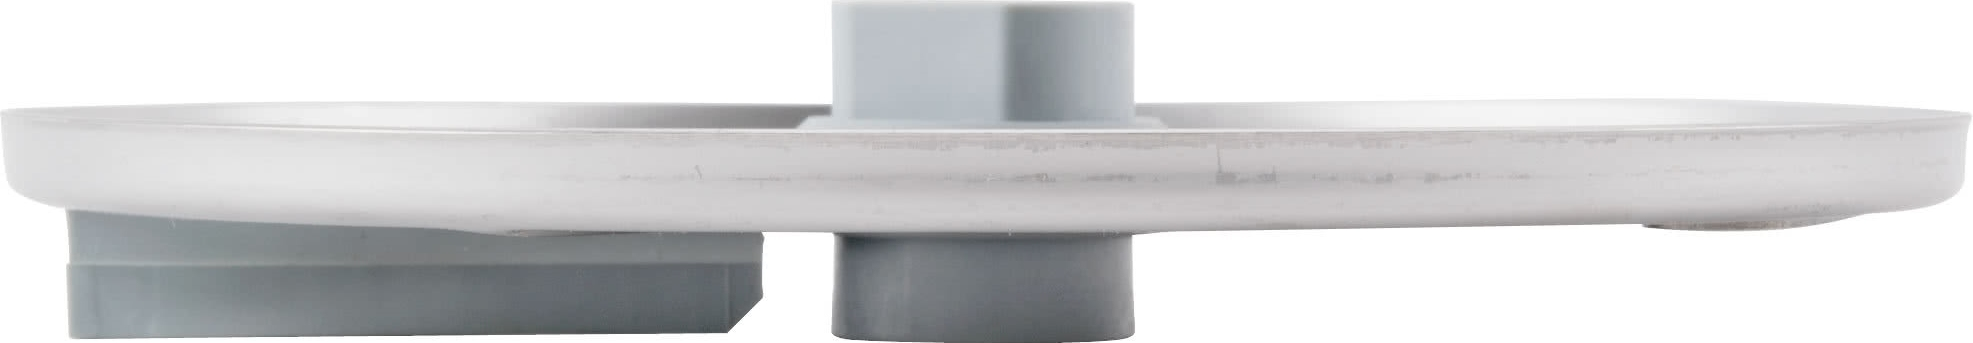 Диск-соломка Robot Coupe 27047(4x4мм) - 3